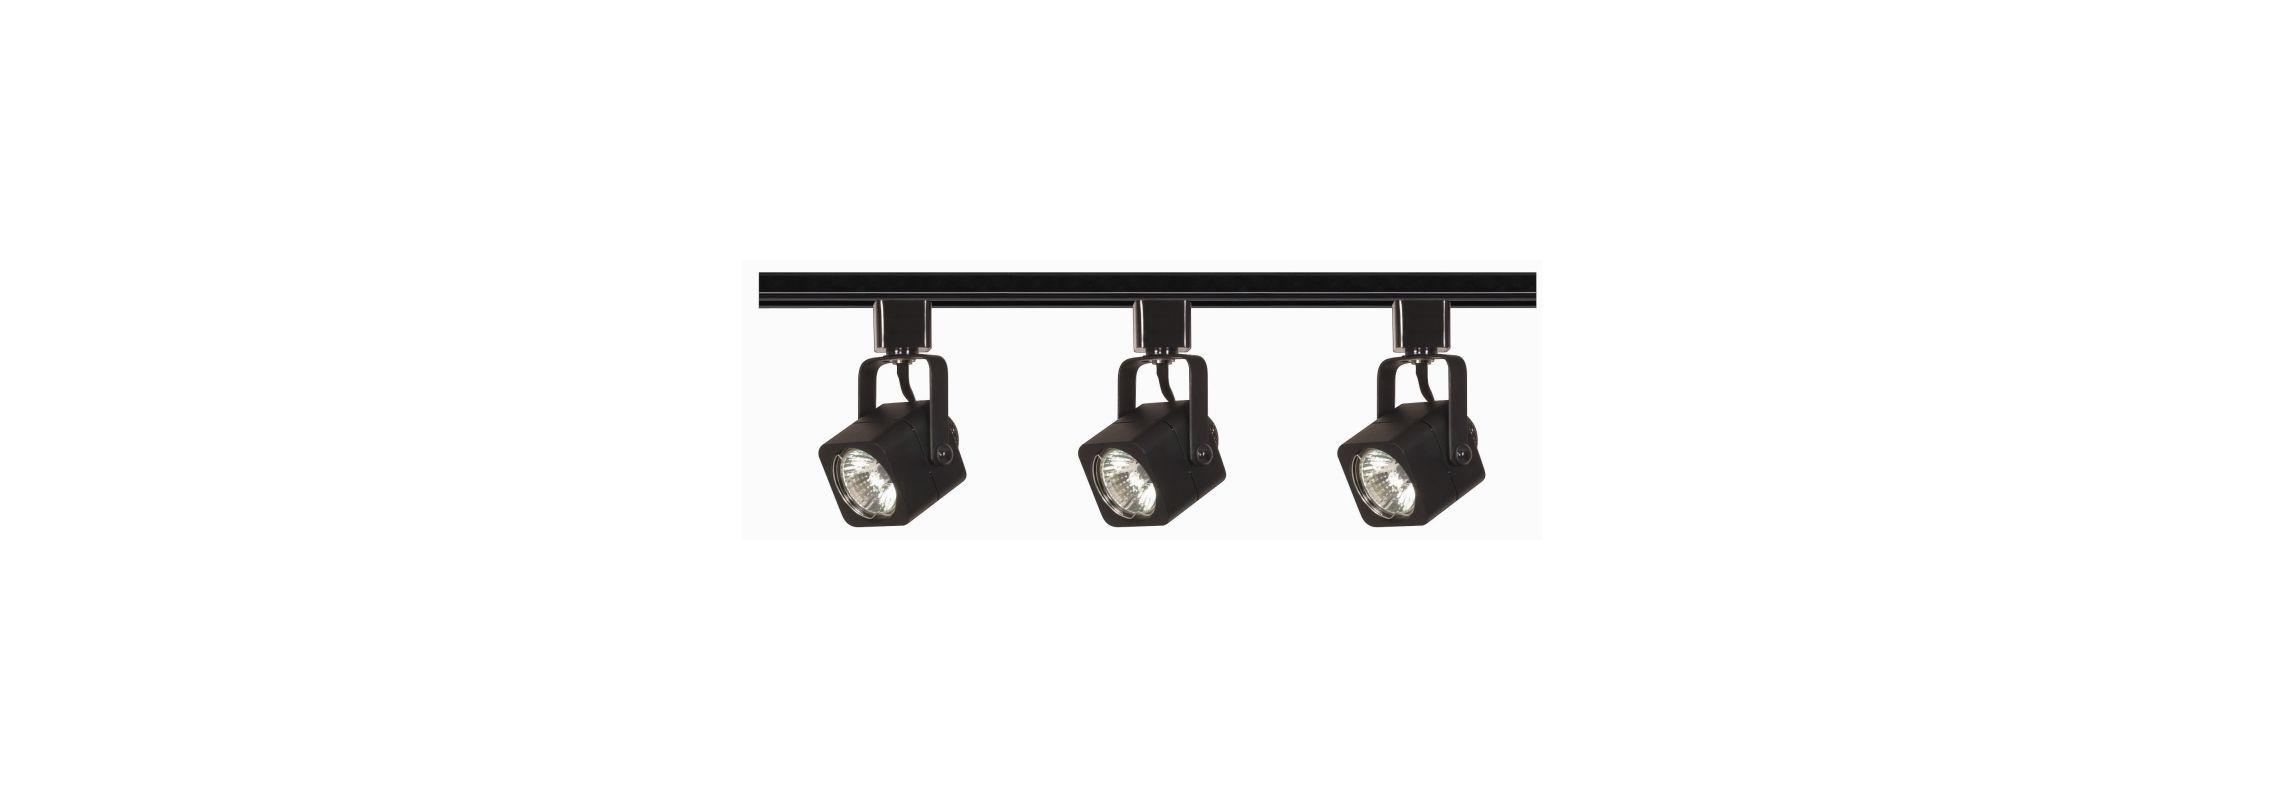 Nuvo Lighting TK346 Three Light MR16 Square 120V Track Kit Black